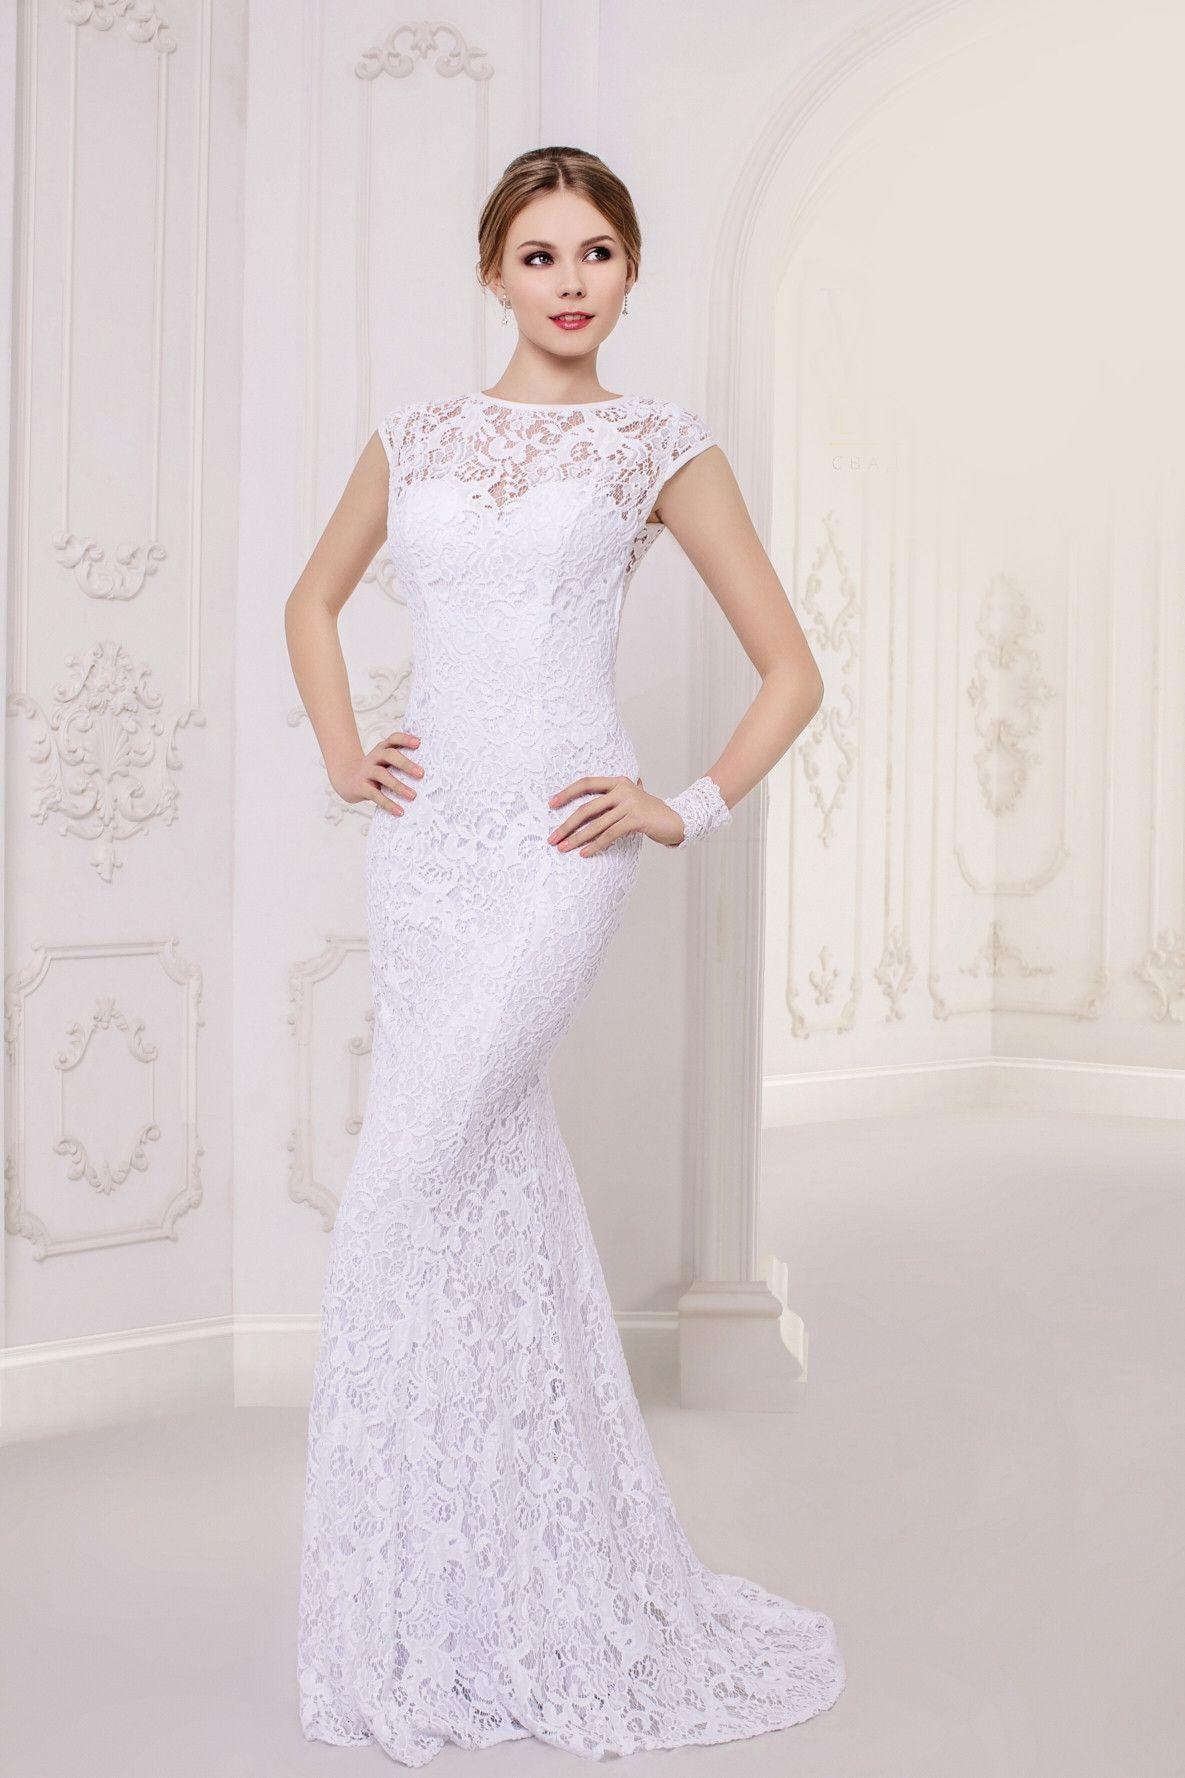 Lace dress wedding  Long Lace Dress Cap Sleeved  Lace dress Cap and Wedding dress